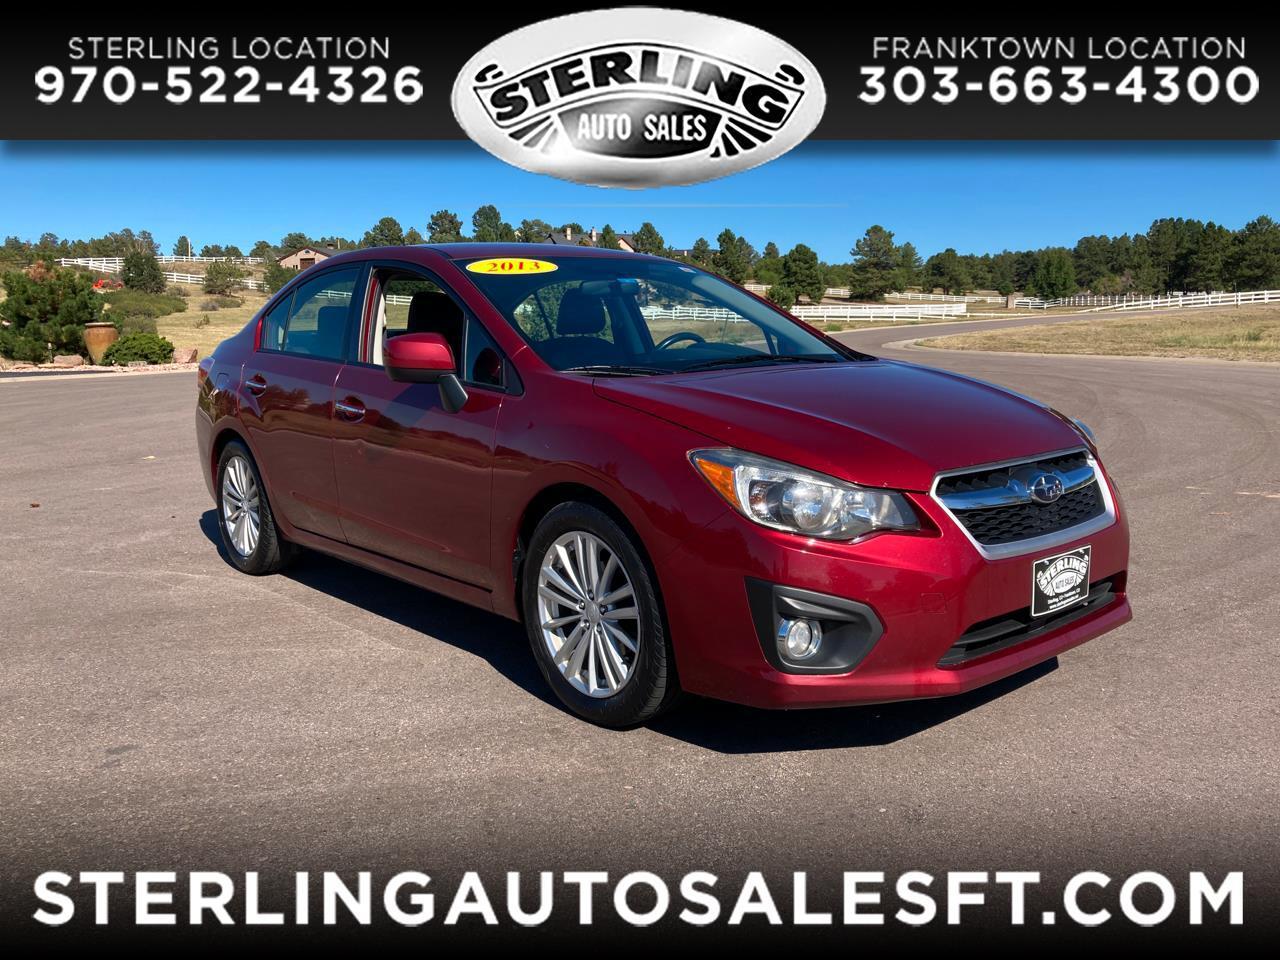 Subaru Impreza Sedan 4dr Auto 2.0i Limited 2013